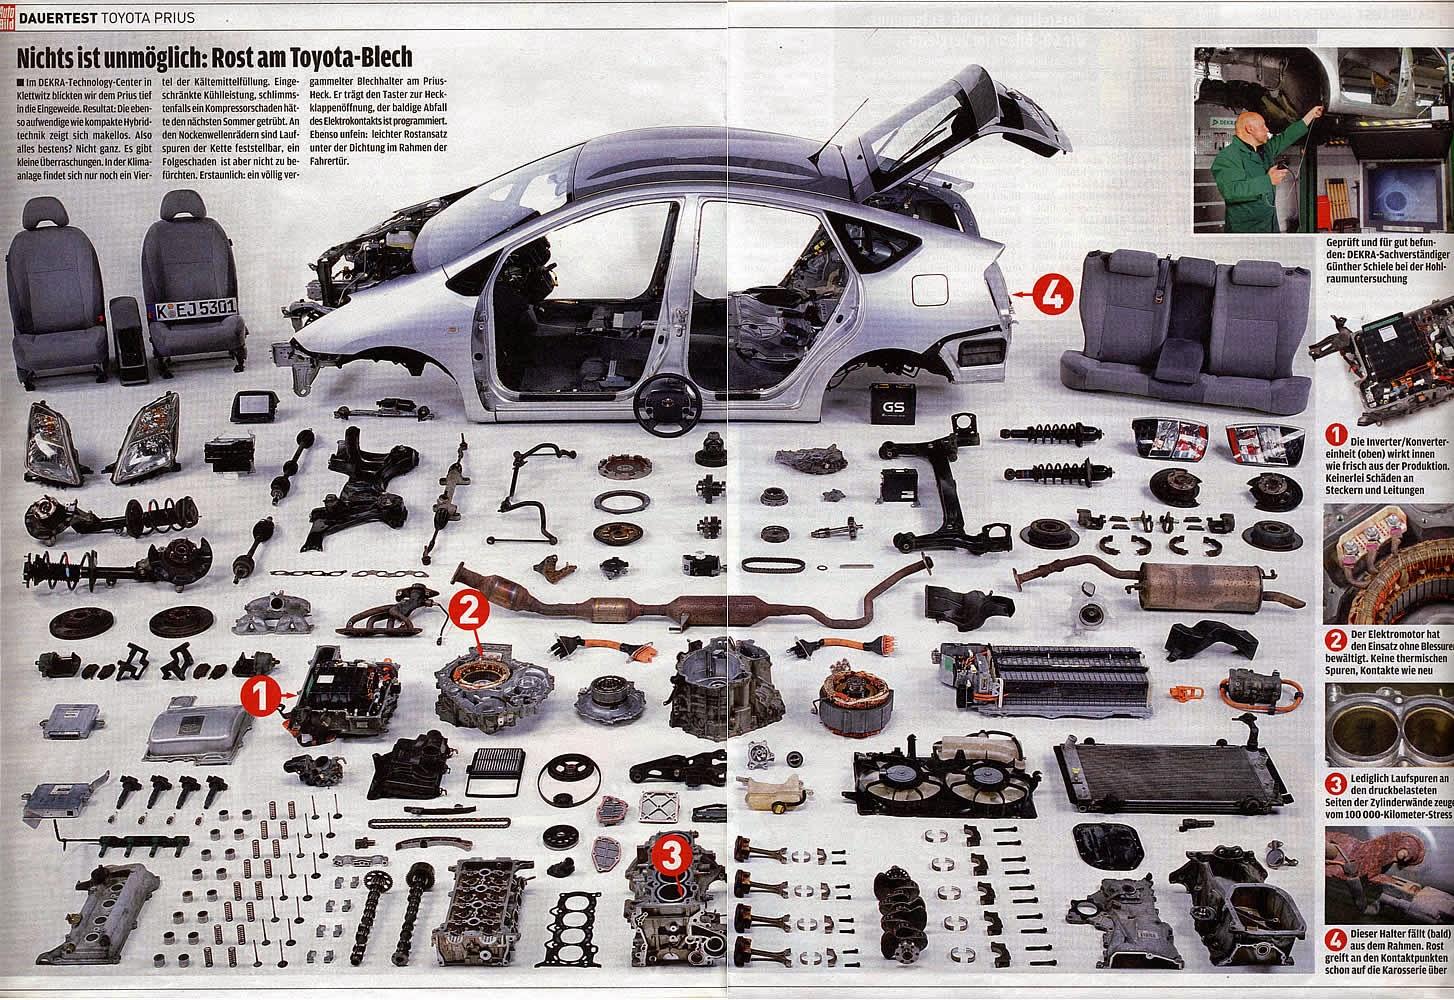 Parts Pictures